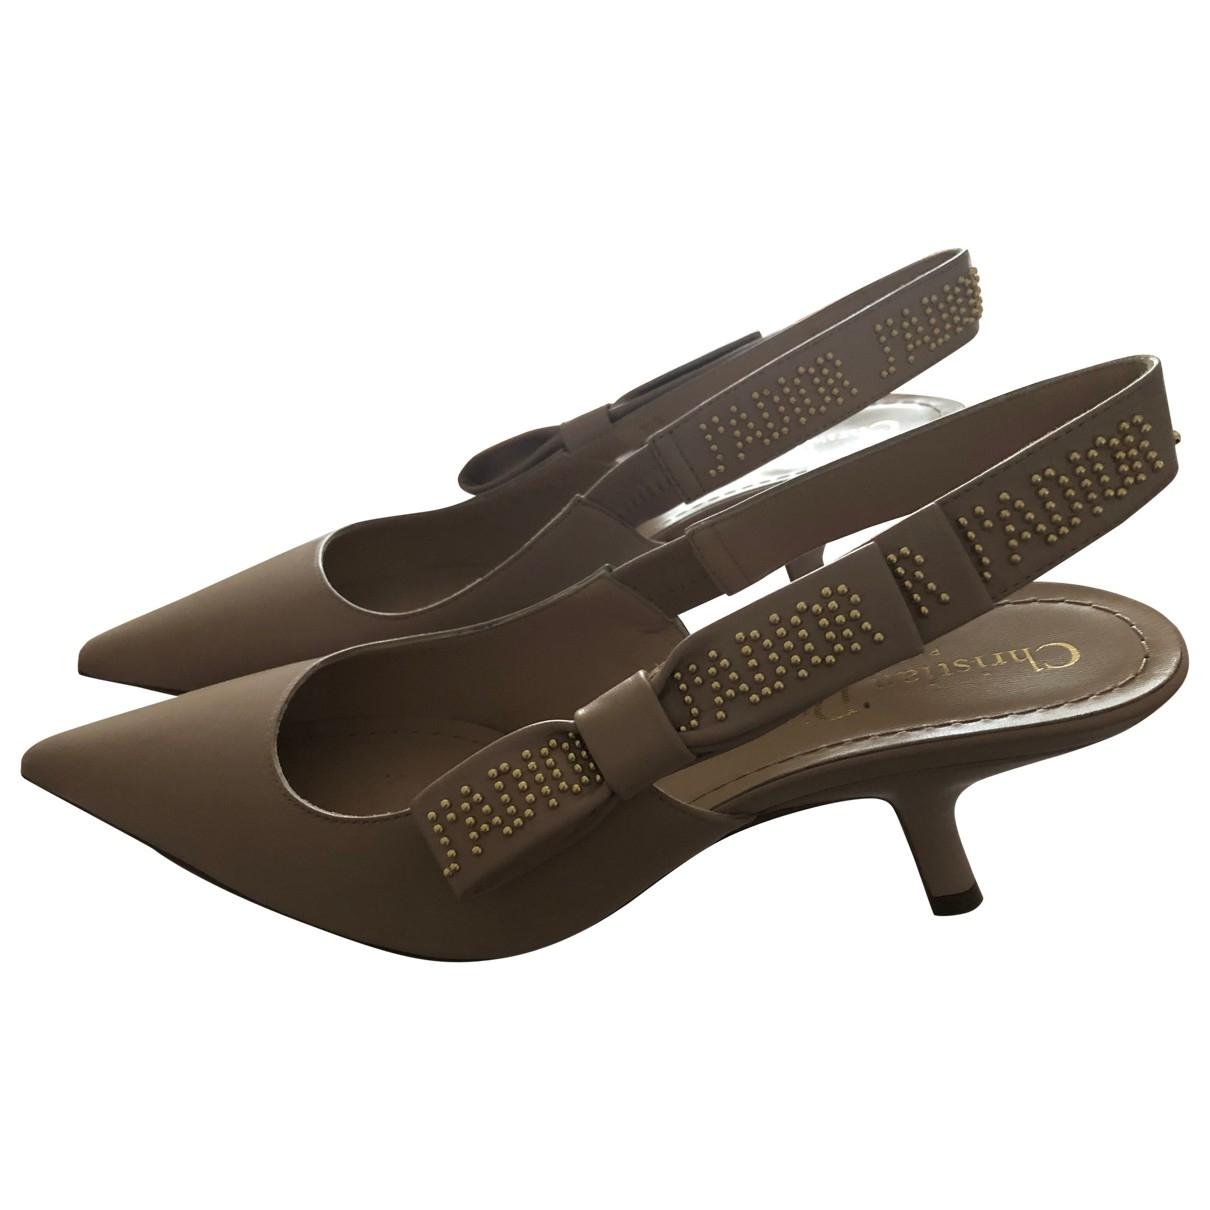 Dior J'adior Beige Leather Heels for Women 36.5 EU